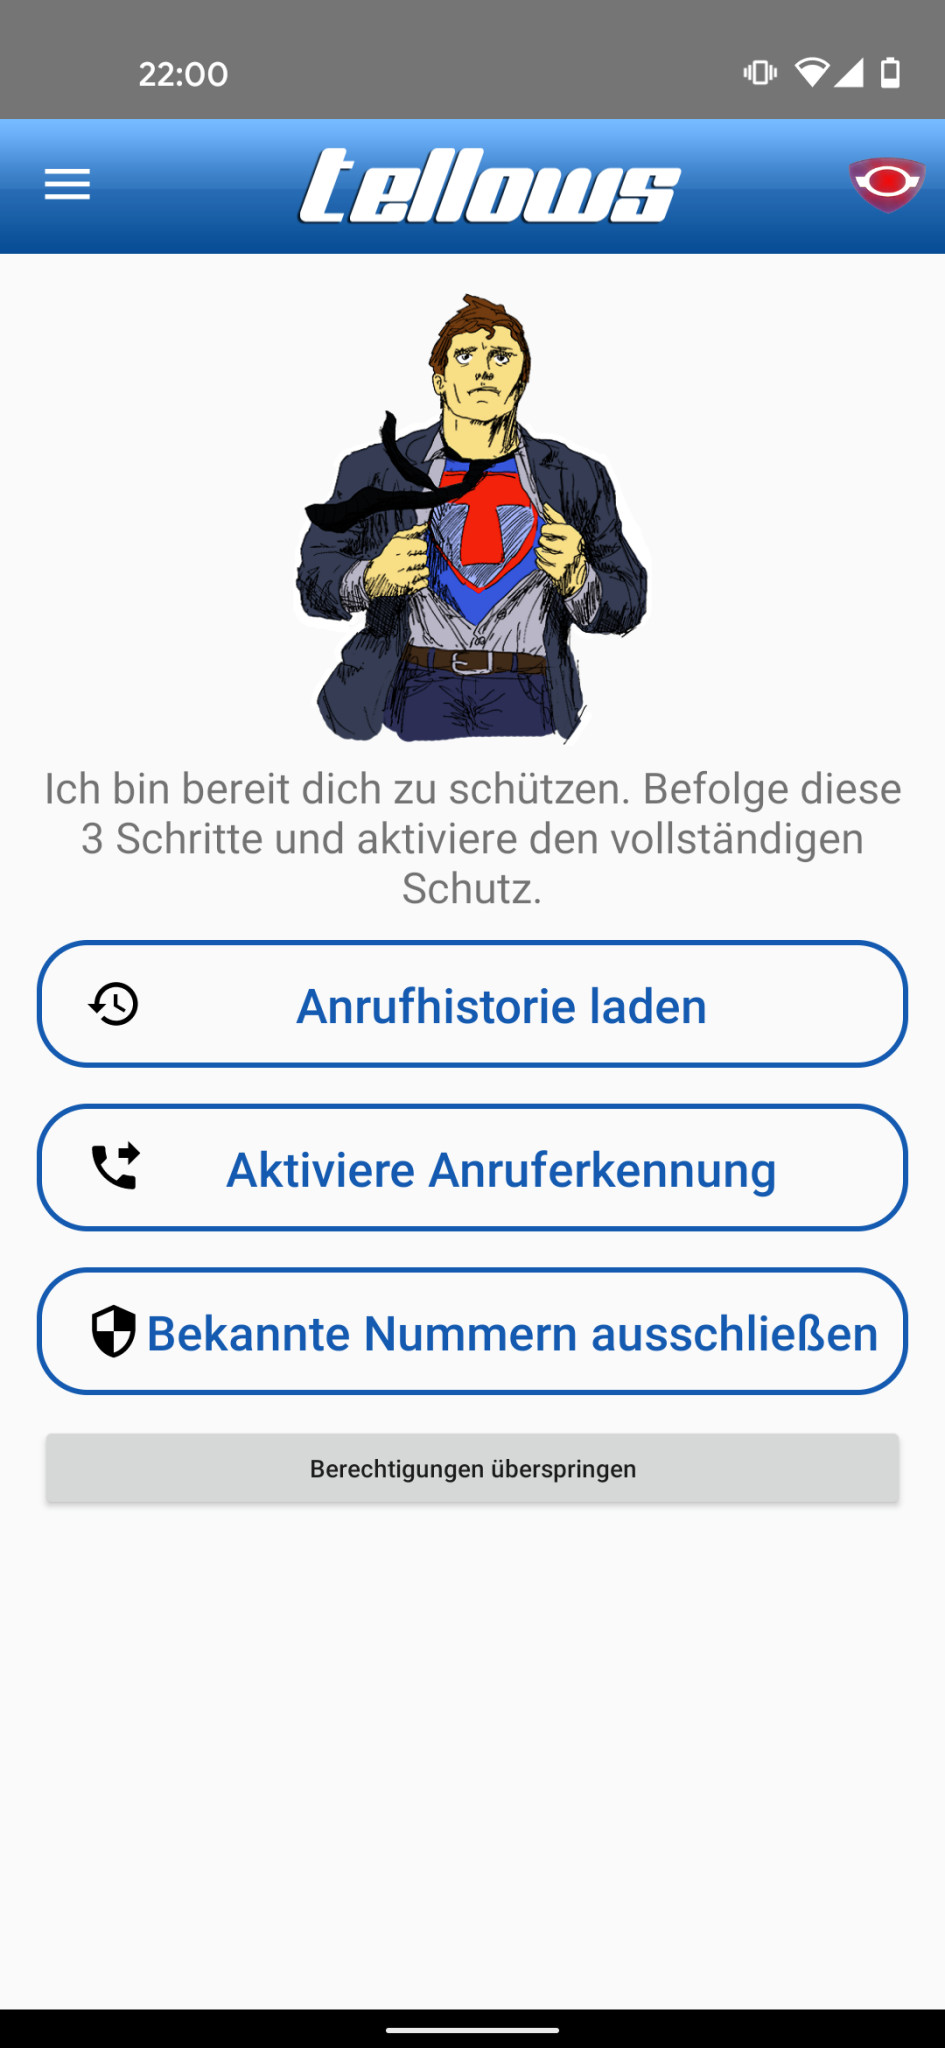 Screenshot 1 - Tellows: Anruferkennung & Blockierung (Android-App)